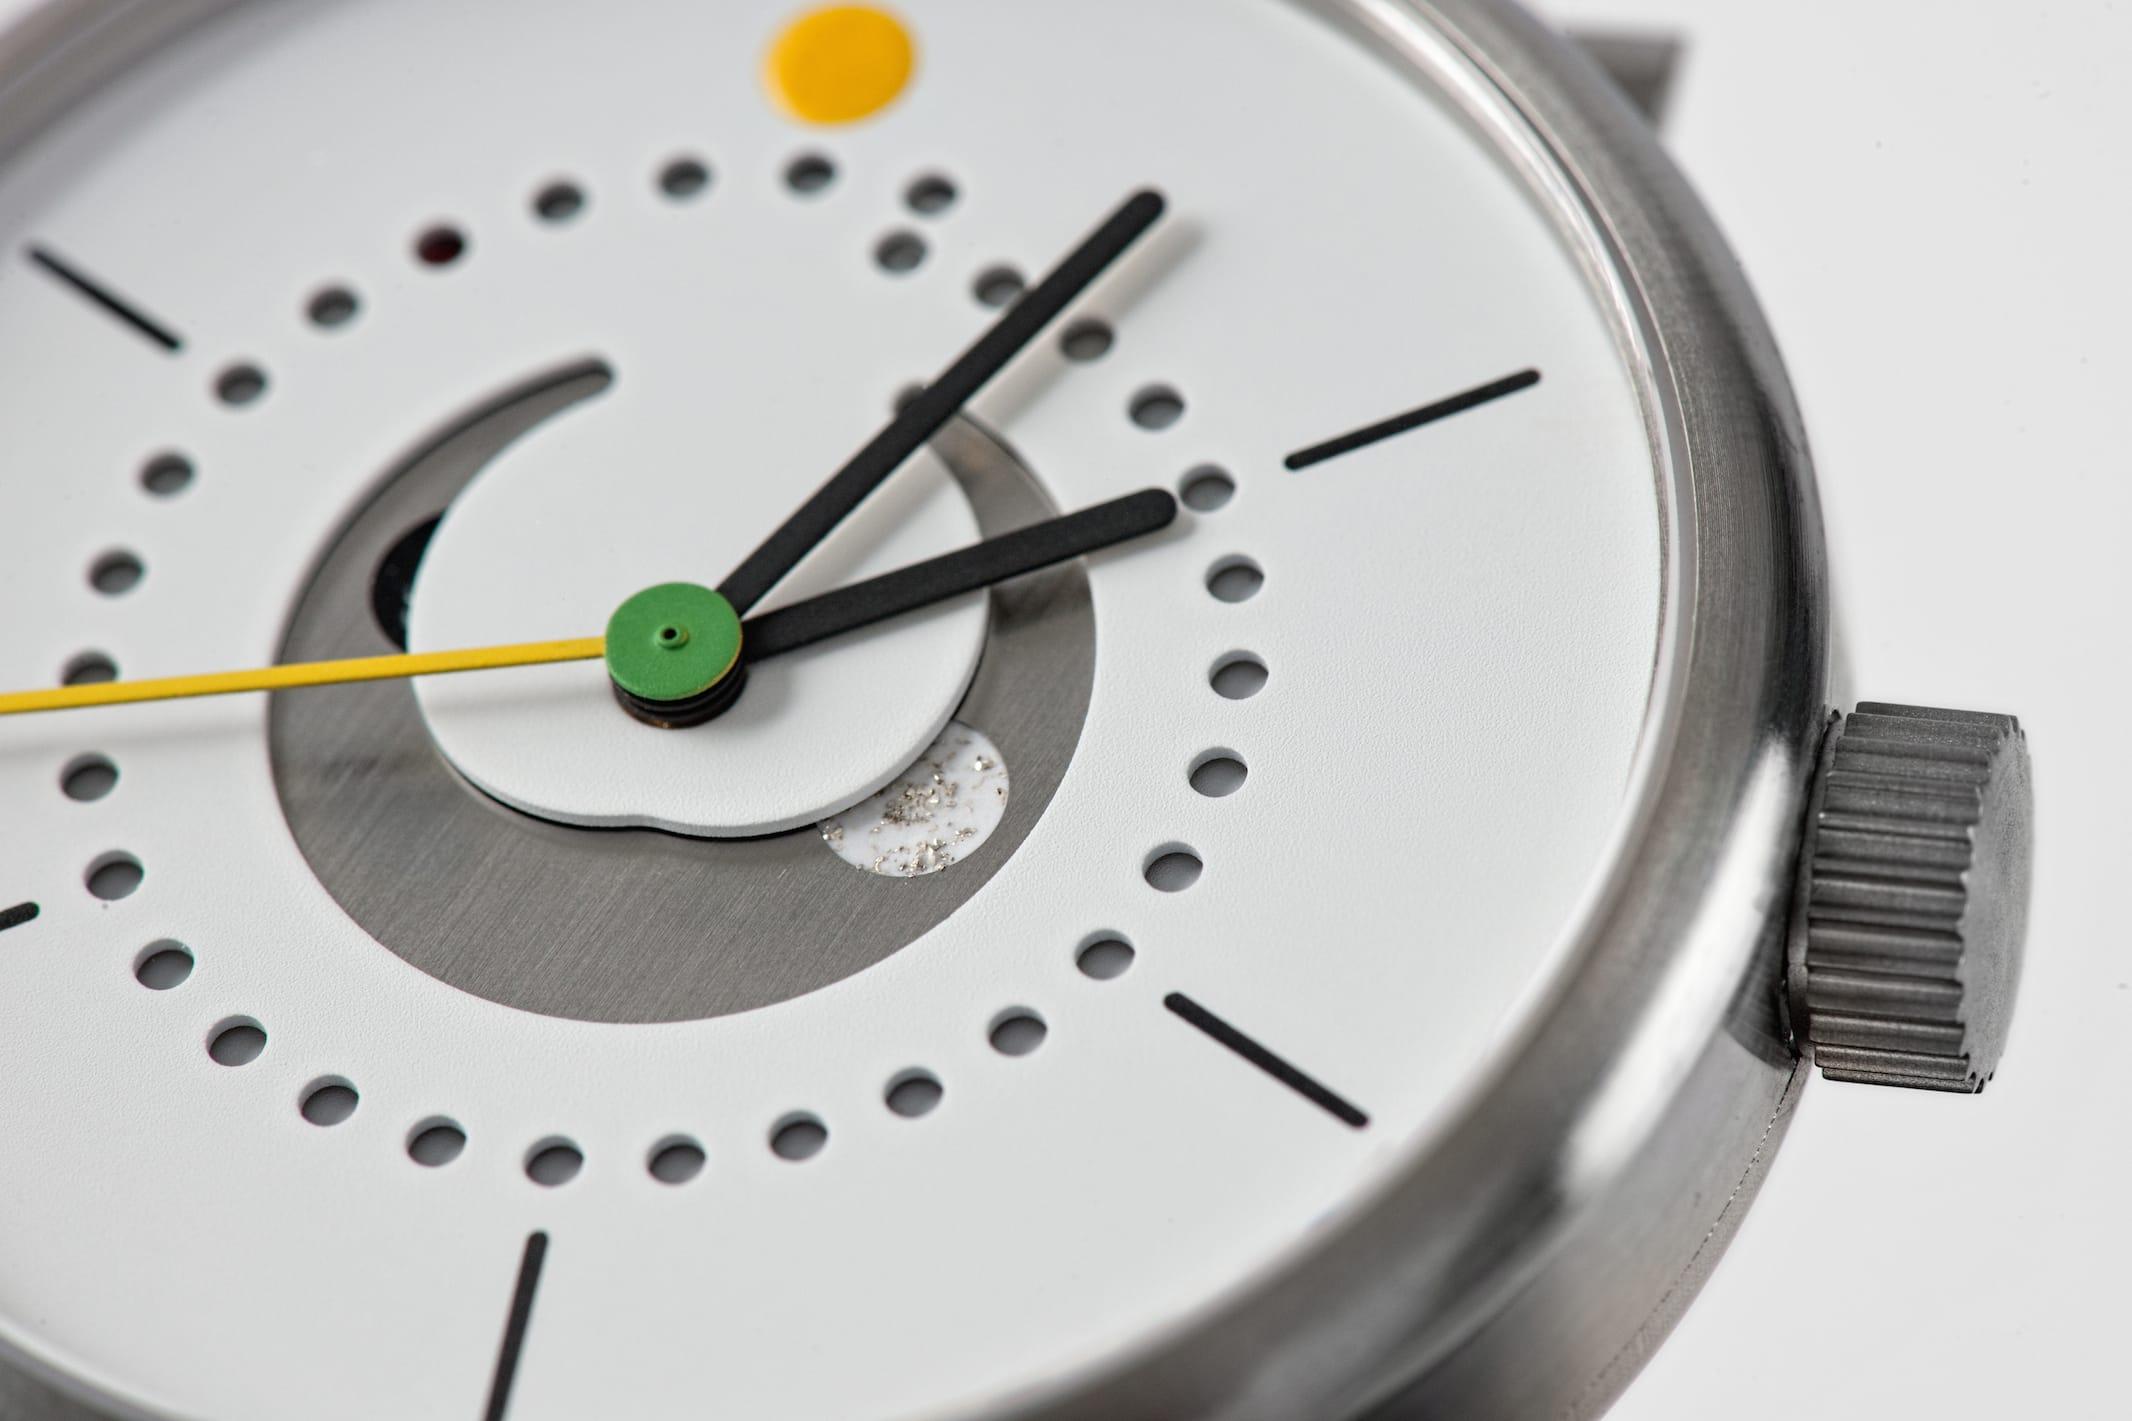 moon-phase-watch-ochs-und-junior-yellow-strap-silver-filings-BEA4643_RGB